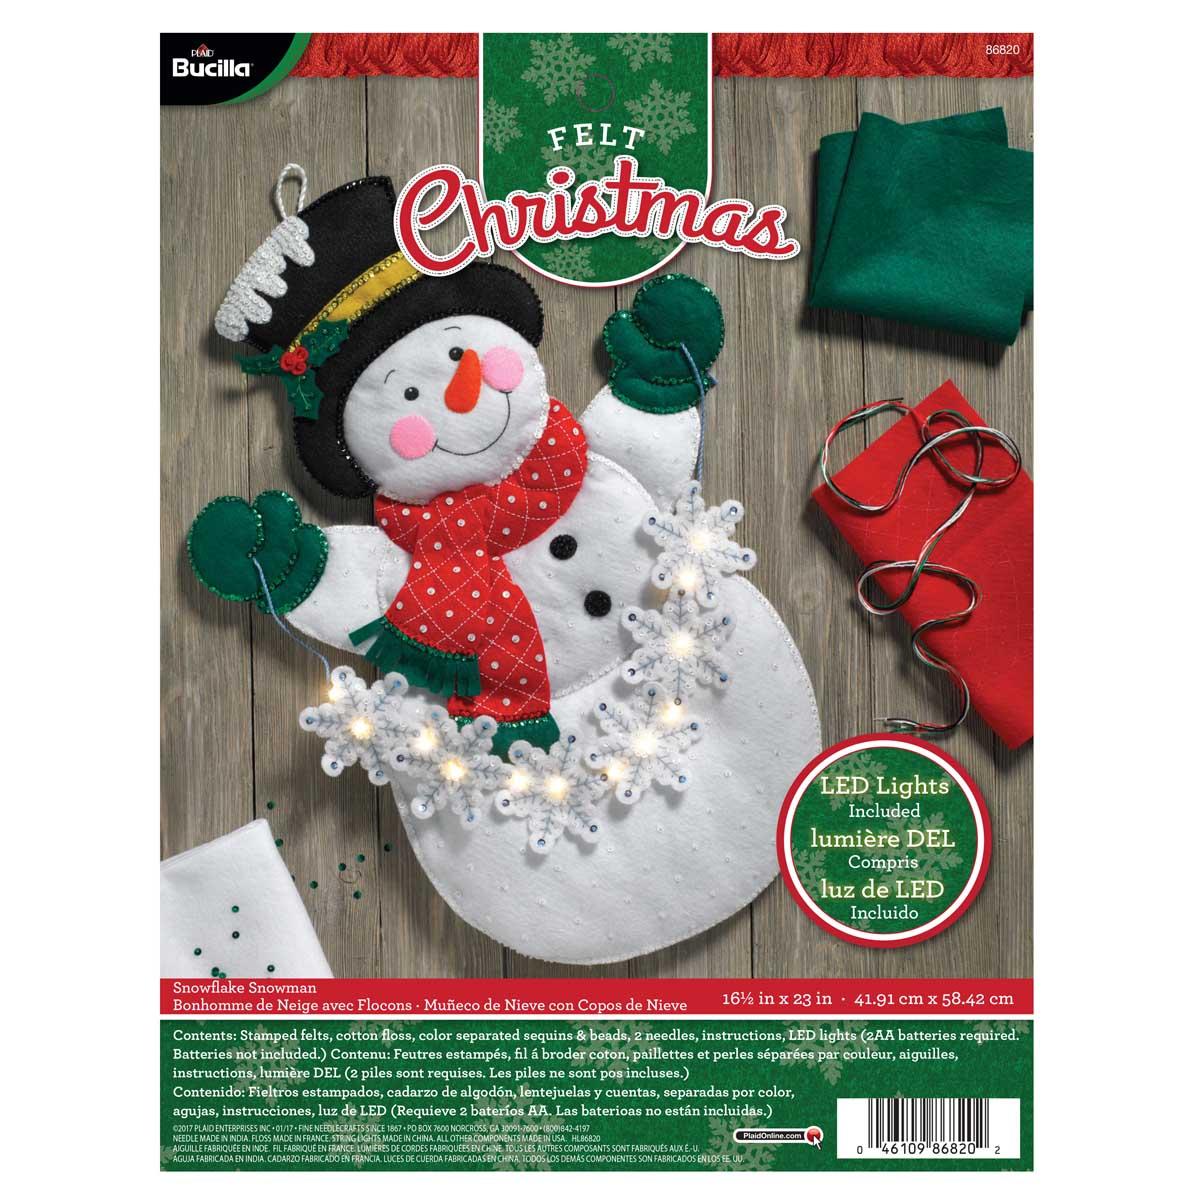 Bucilla ® Seasonal - Felt - Home Decor - Snowman with Snowflakes Wall Hanging with Lights - 86820